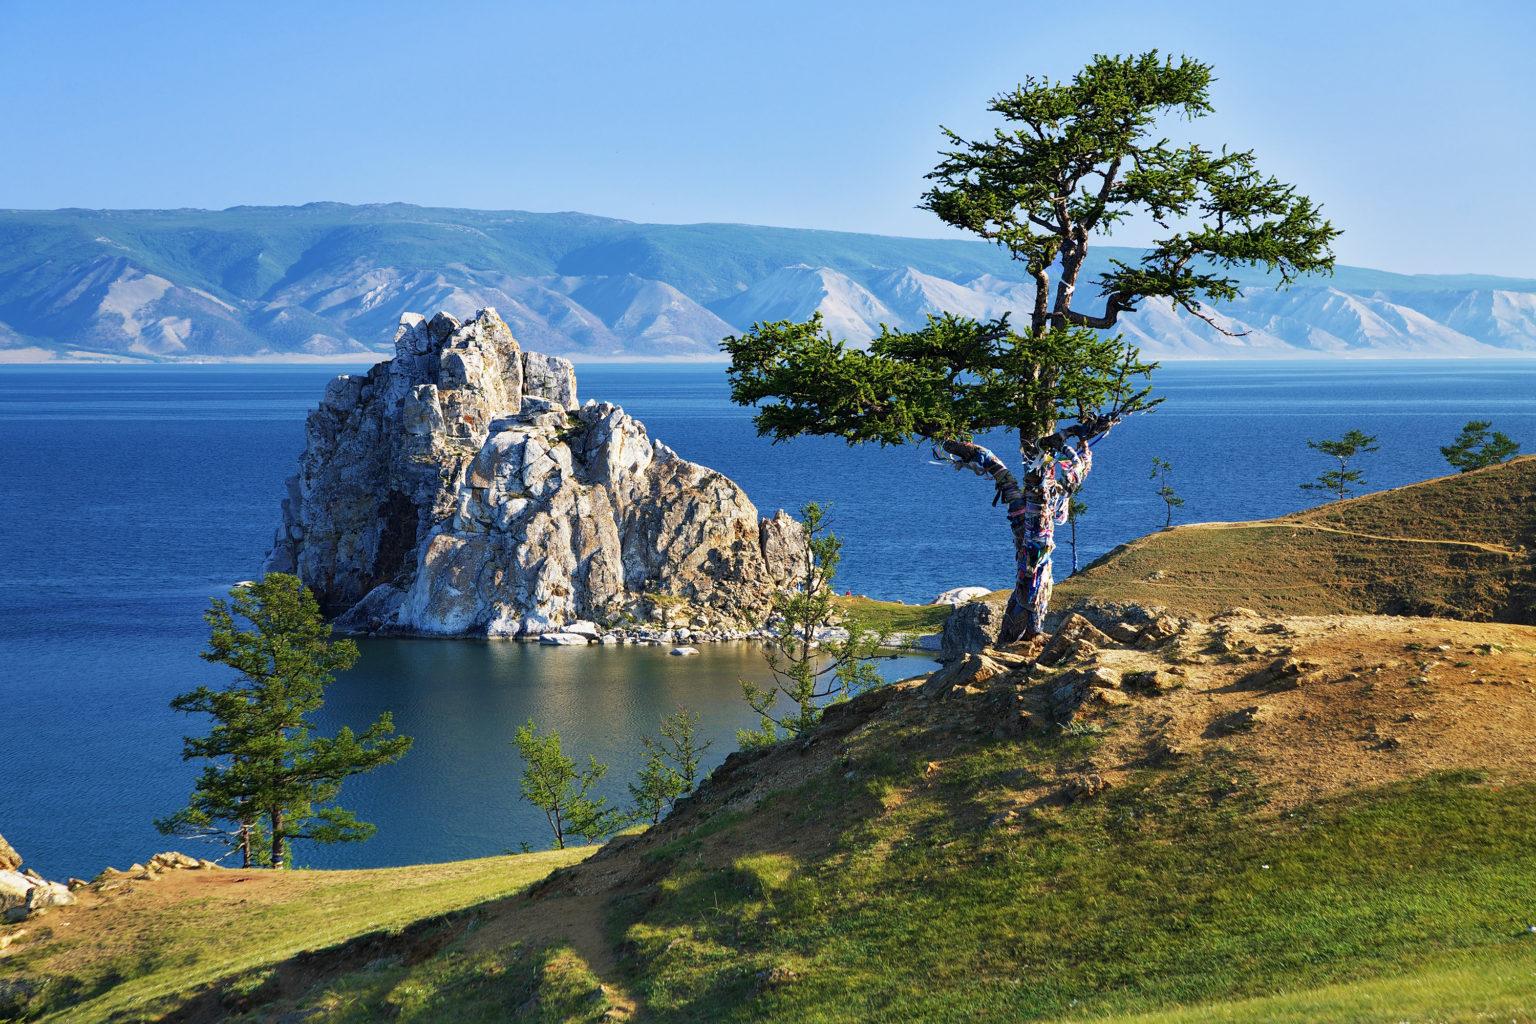 Lisvianka day tour near Lake Baikal 1